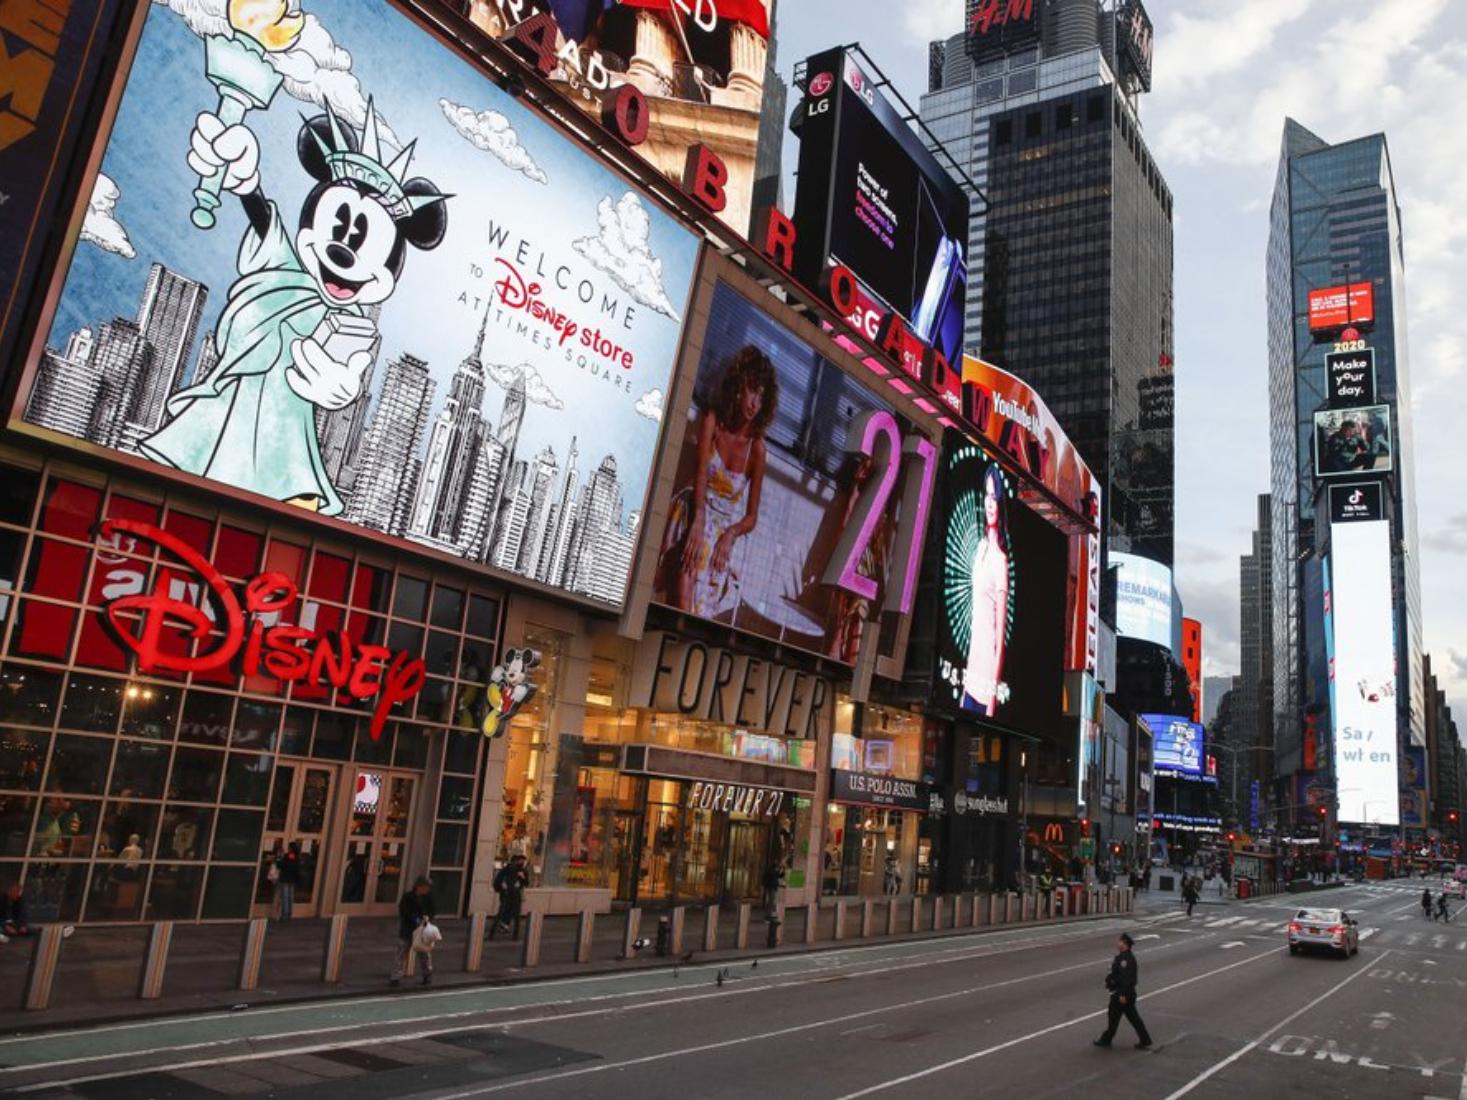 City sleeps: A look at empty NYC streets amid the virus